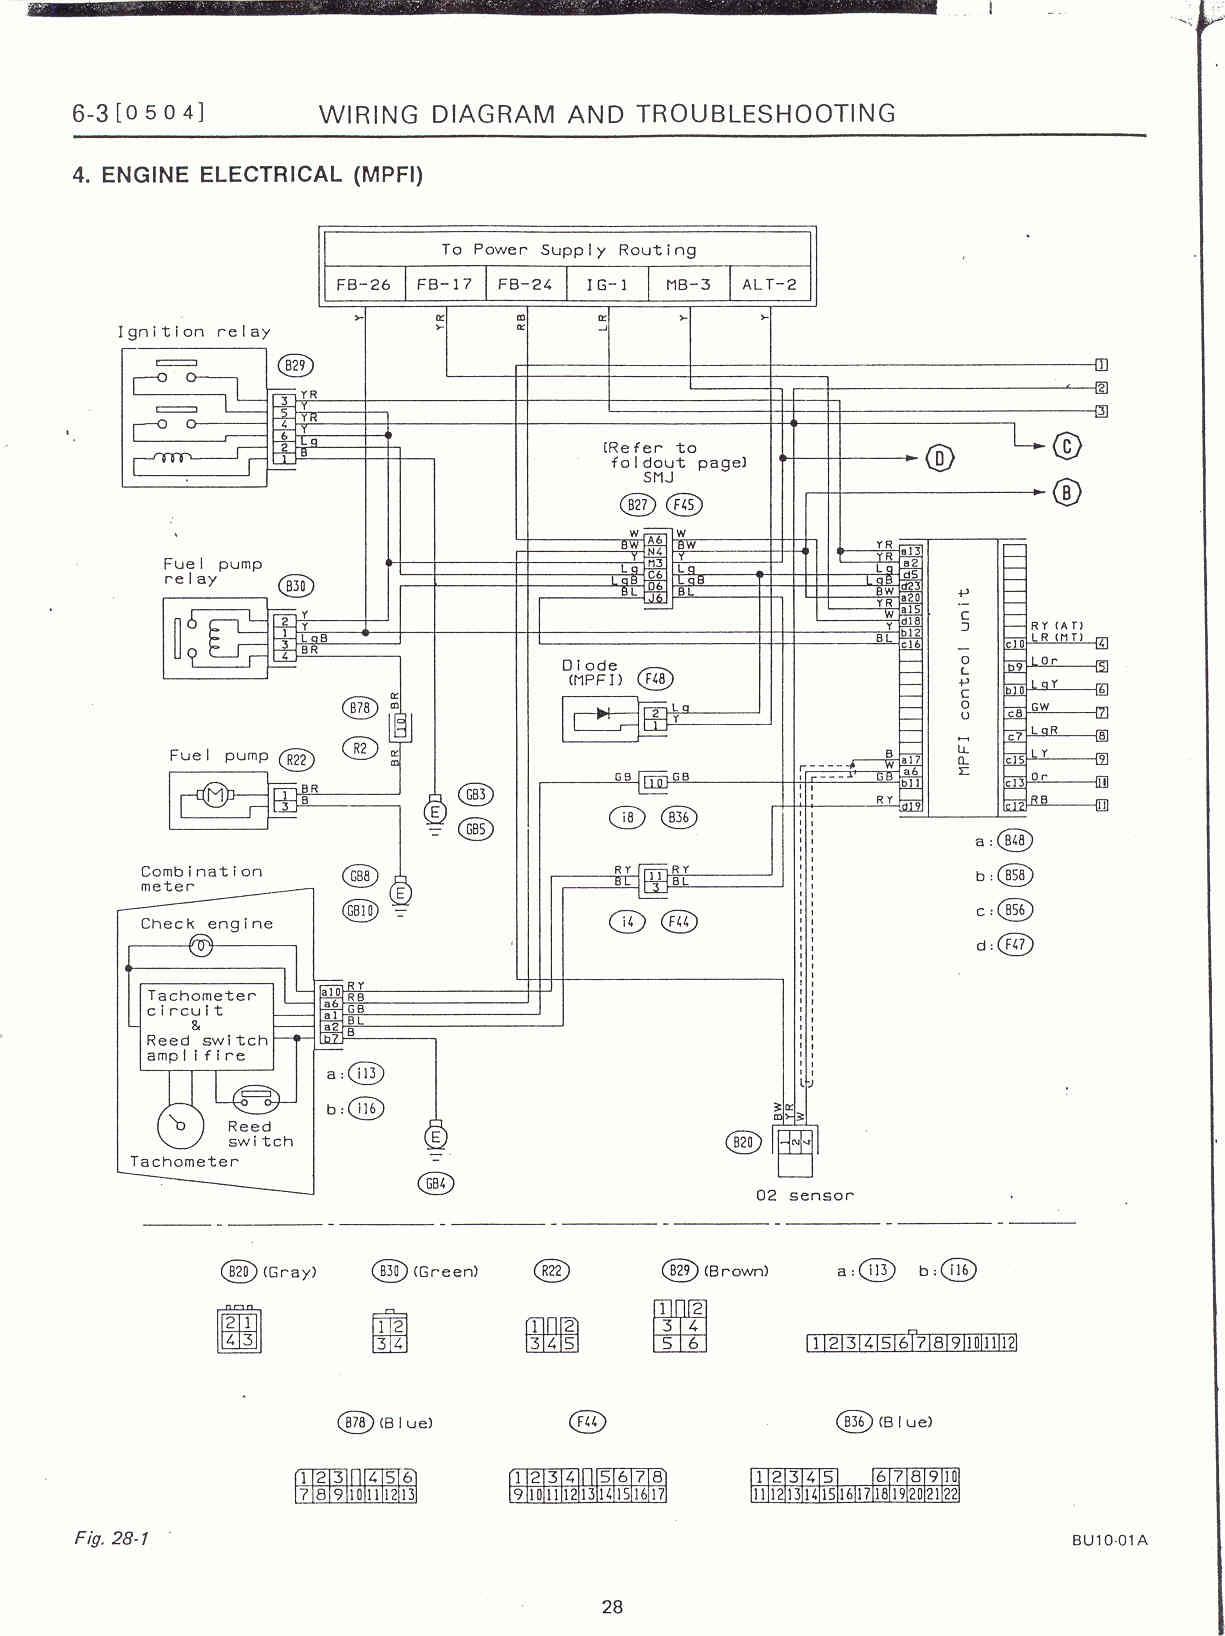 Wrx Wiring Diagram Home Link